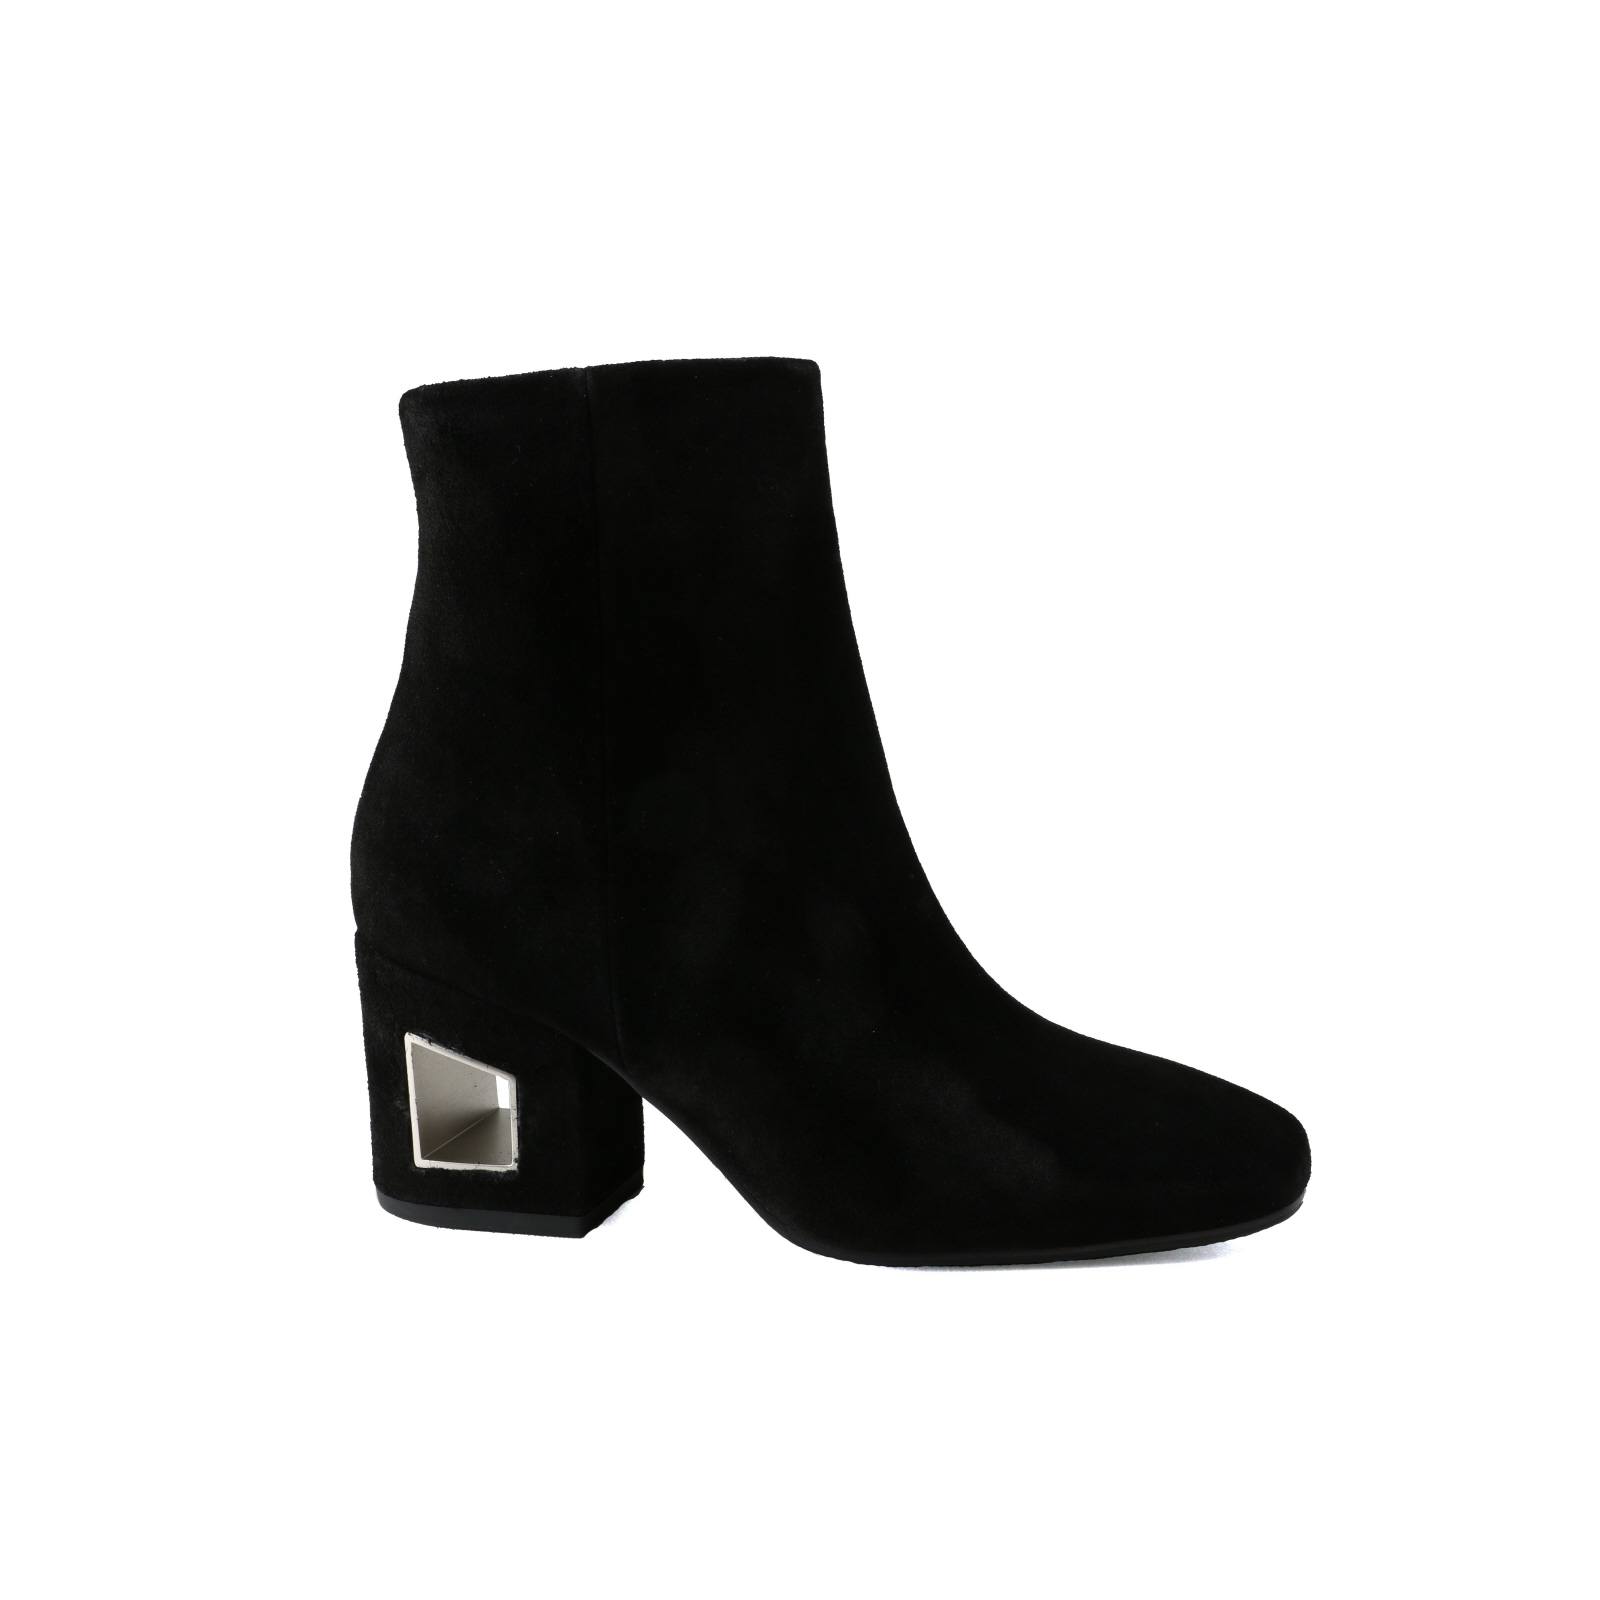 Femmes Bottine Vic Matie à la mode noir velourleder NEUF T. 41